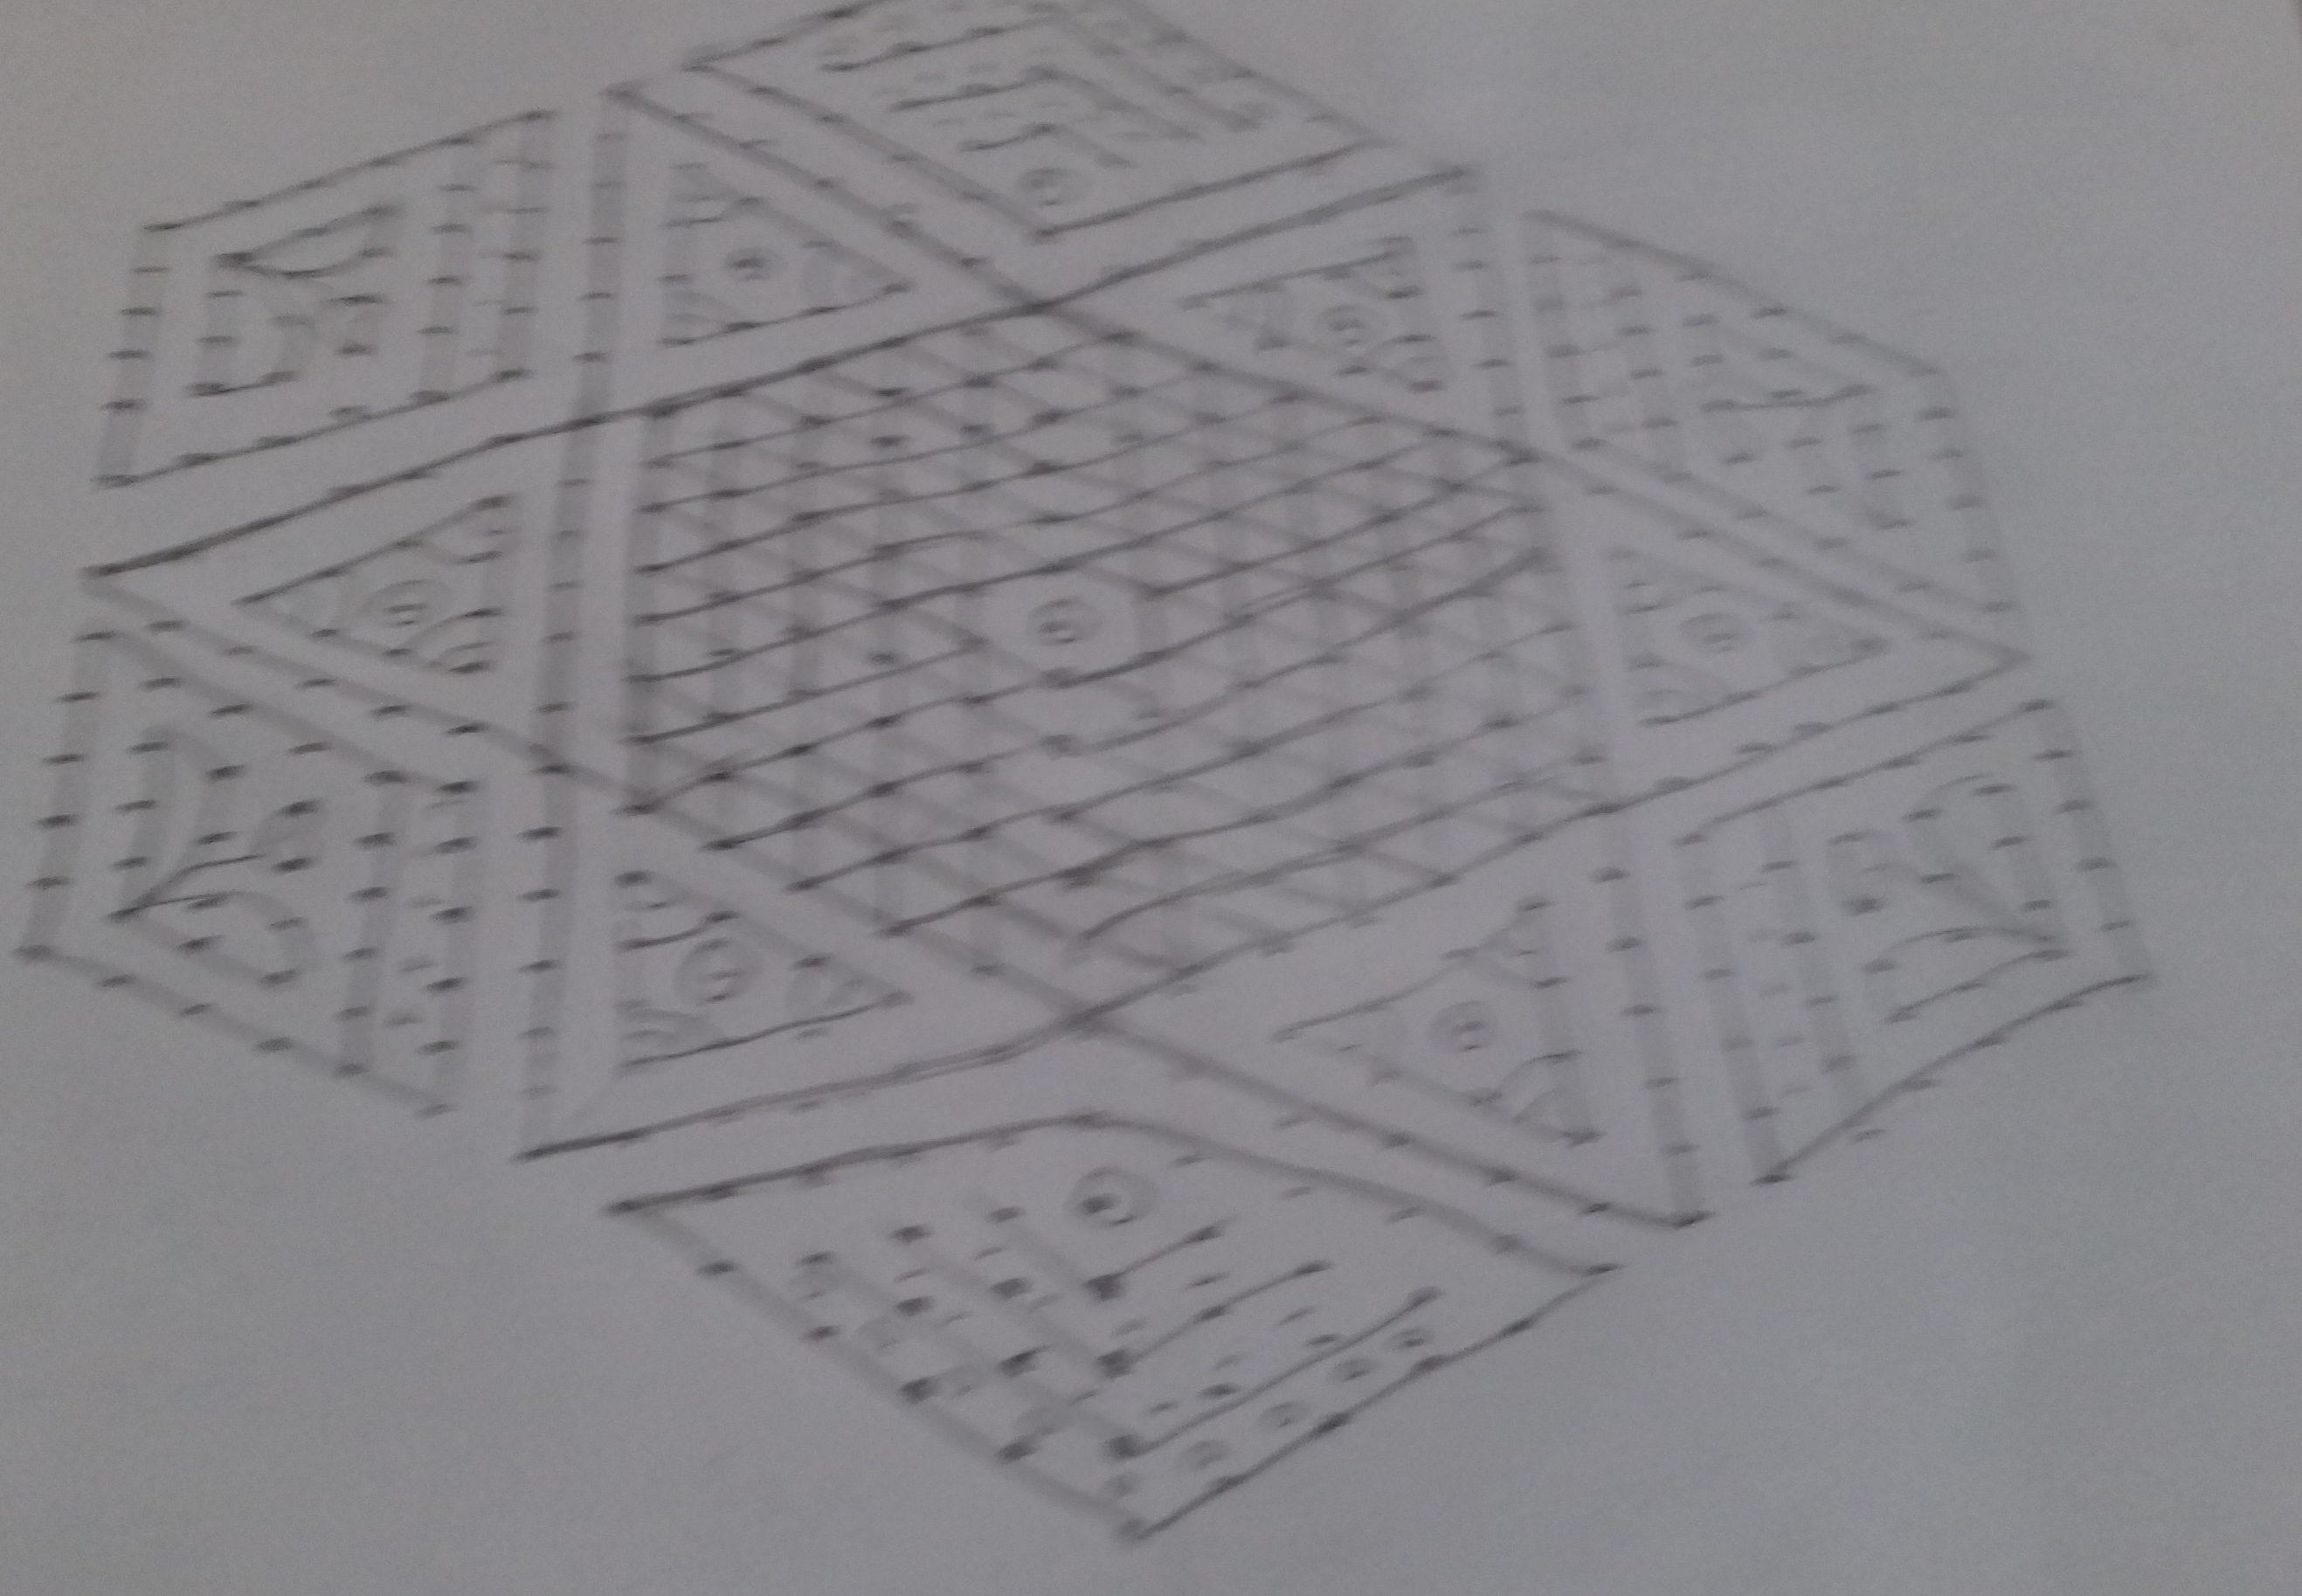 25-13 dots design kolam || contest kolam